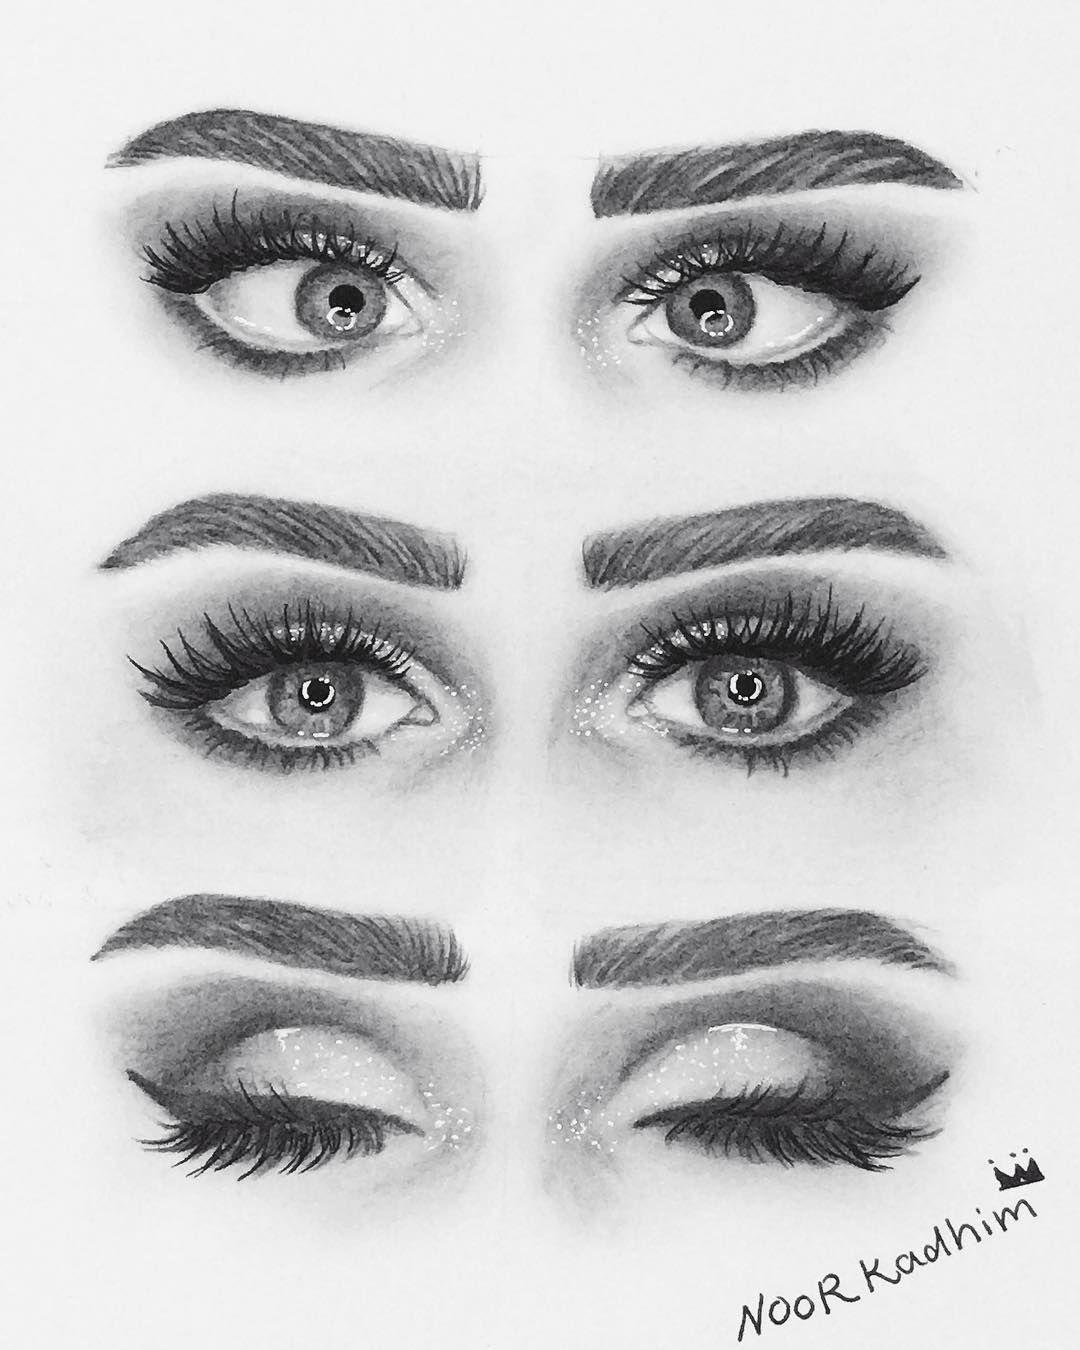 رسمتي رسم رسومات رسمتي فن لمسة عراقية لمسة فن عيون رموش مكياج لوحات رماديه ابيض اسود رمزيات Art Drawings Simple Cute Art Styles Art Drawings